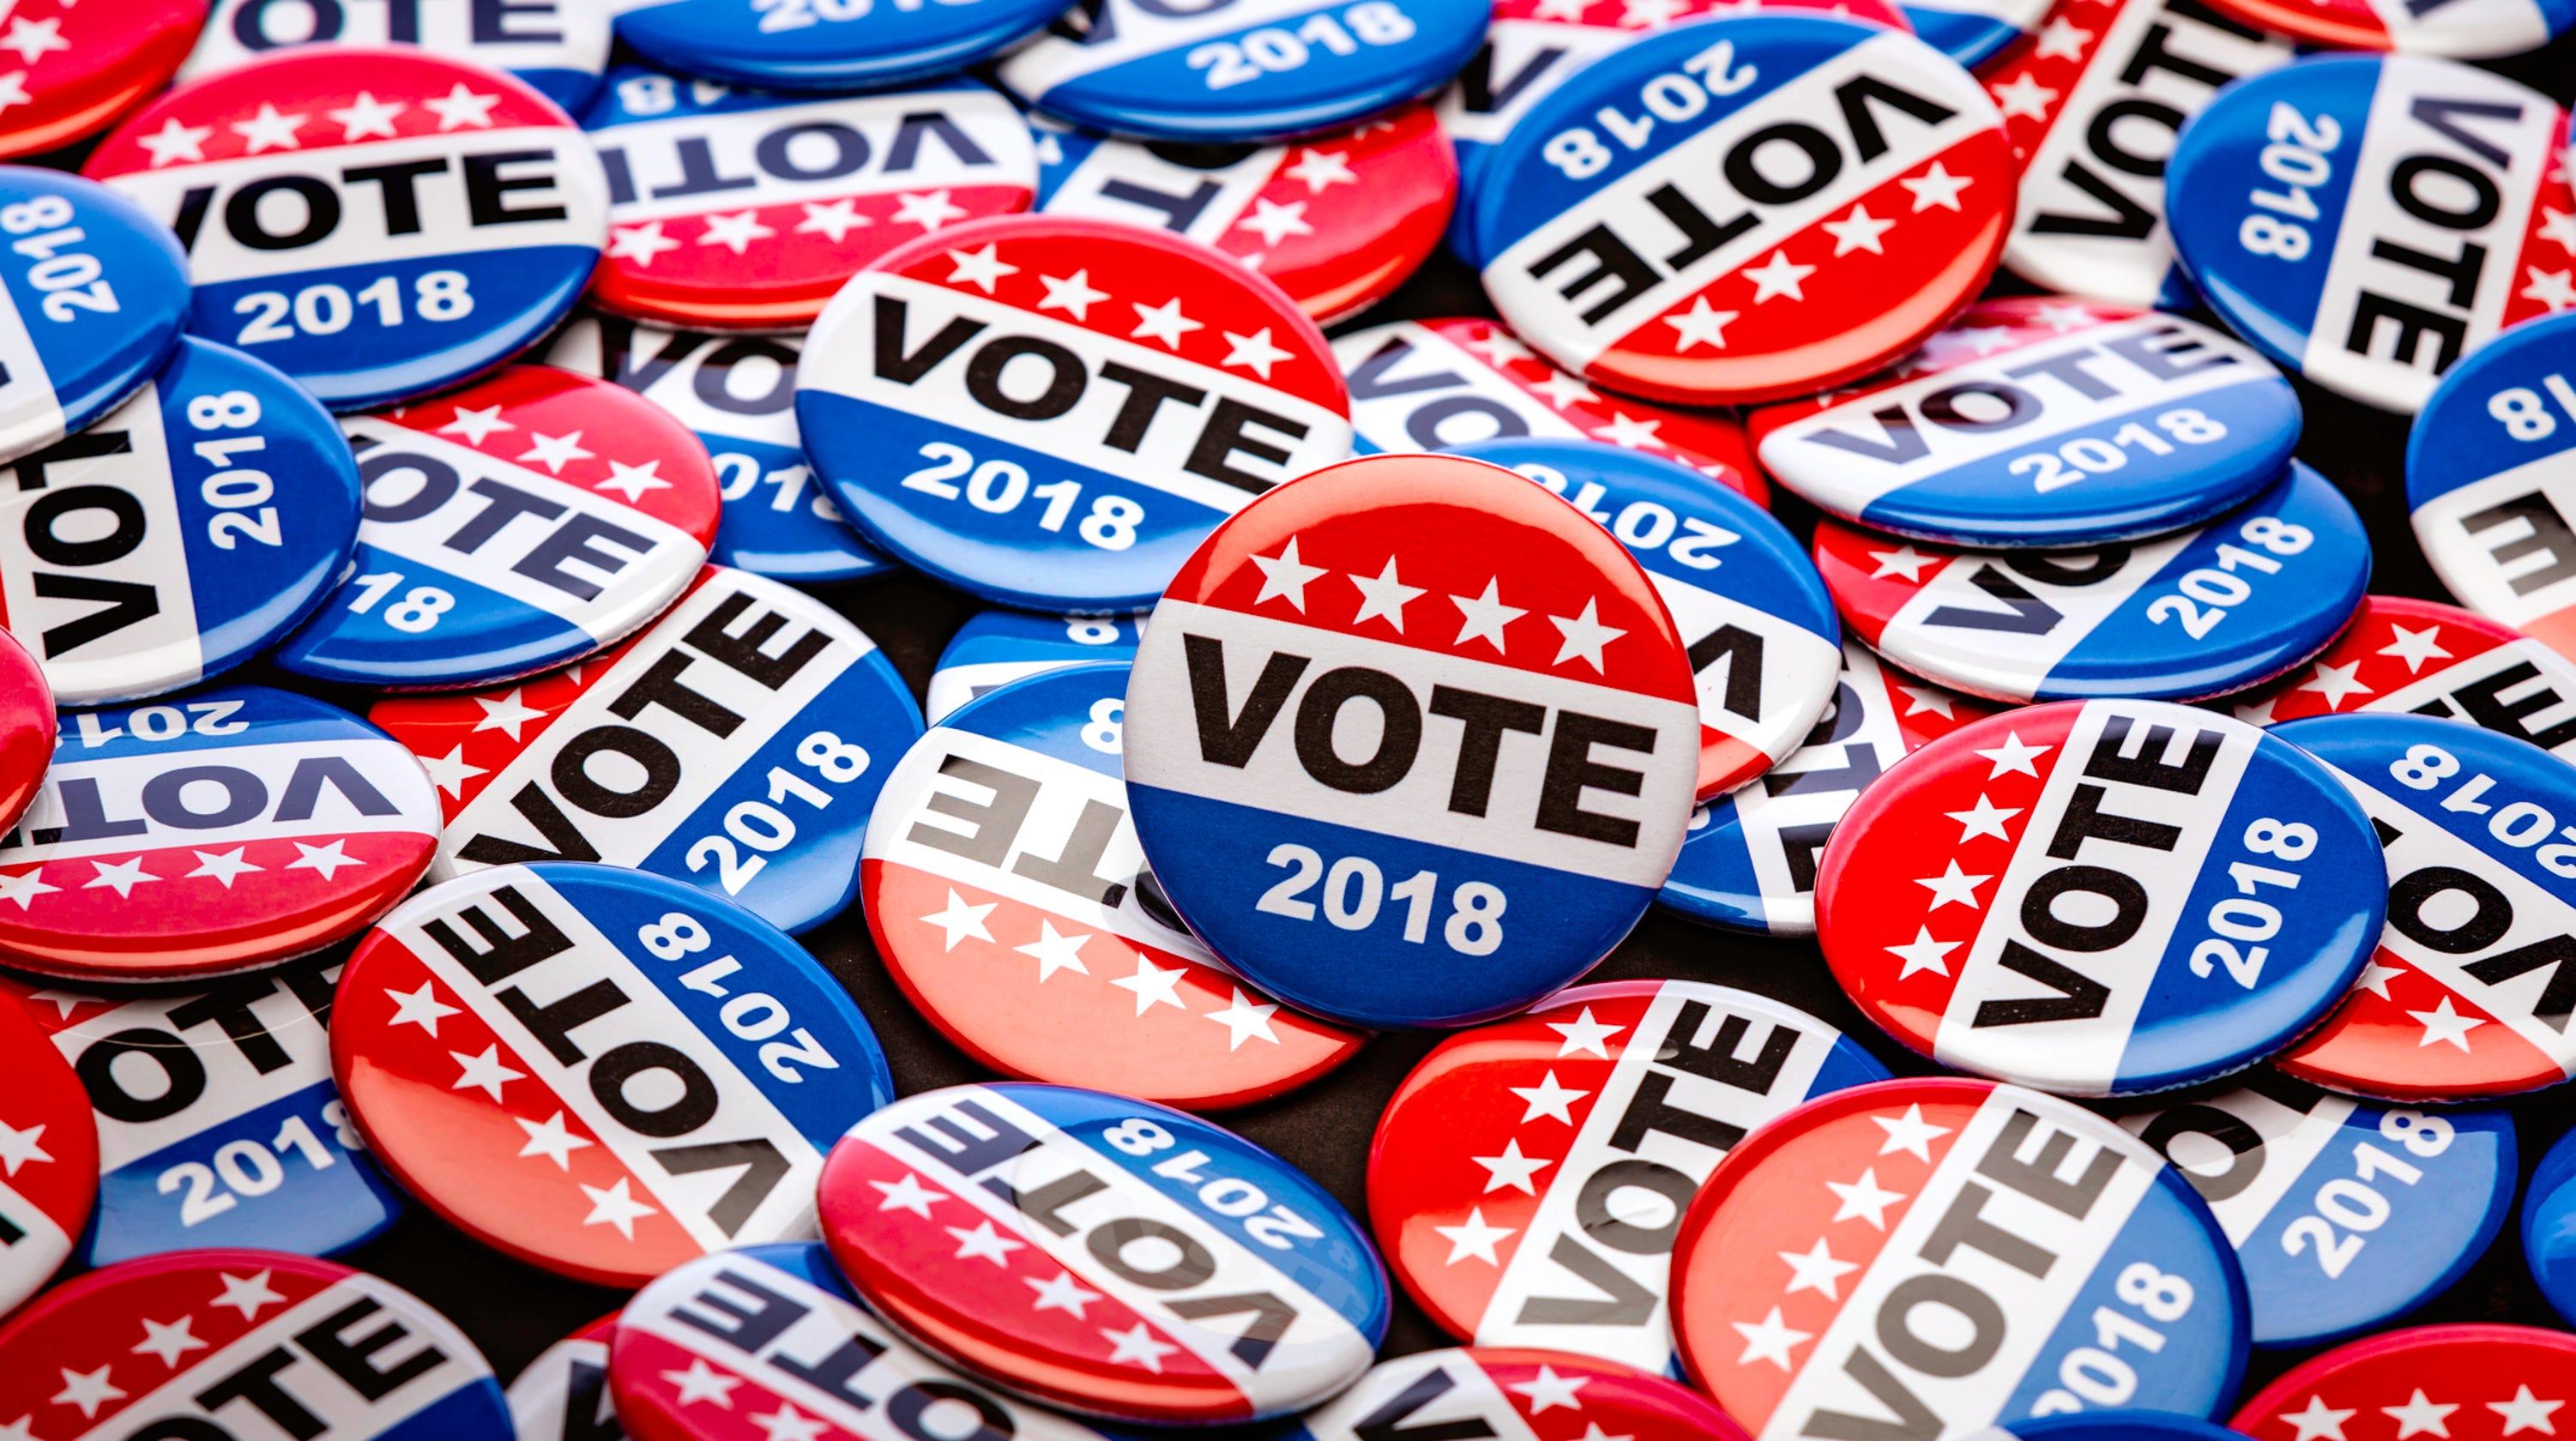 Image result for vote 2018